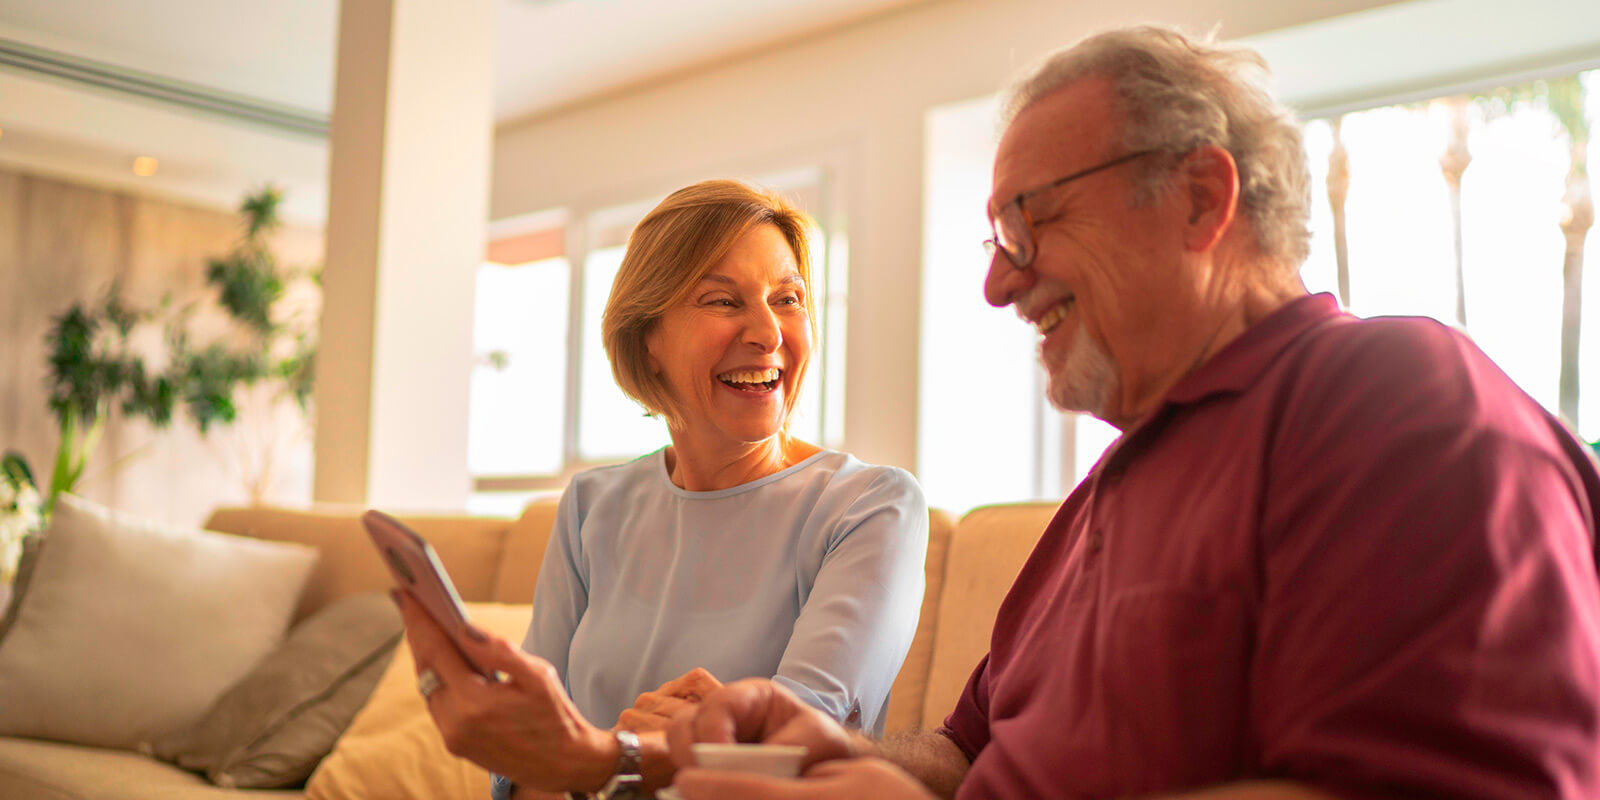 Empréstimo rápido e seguro. Conheça o empréstimo consignado